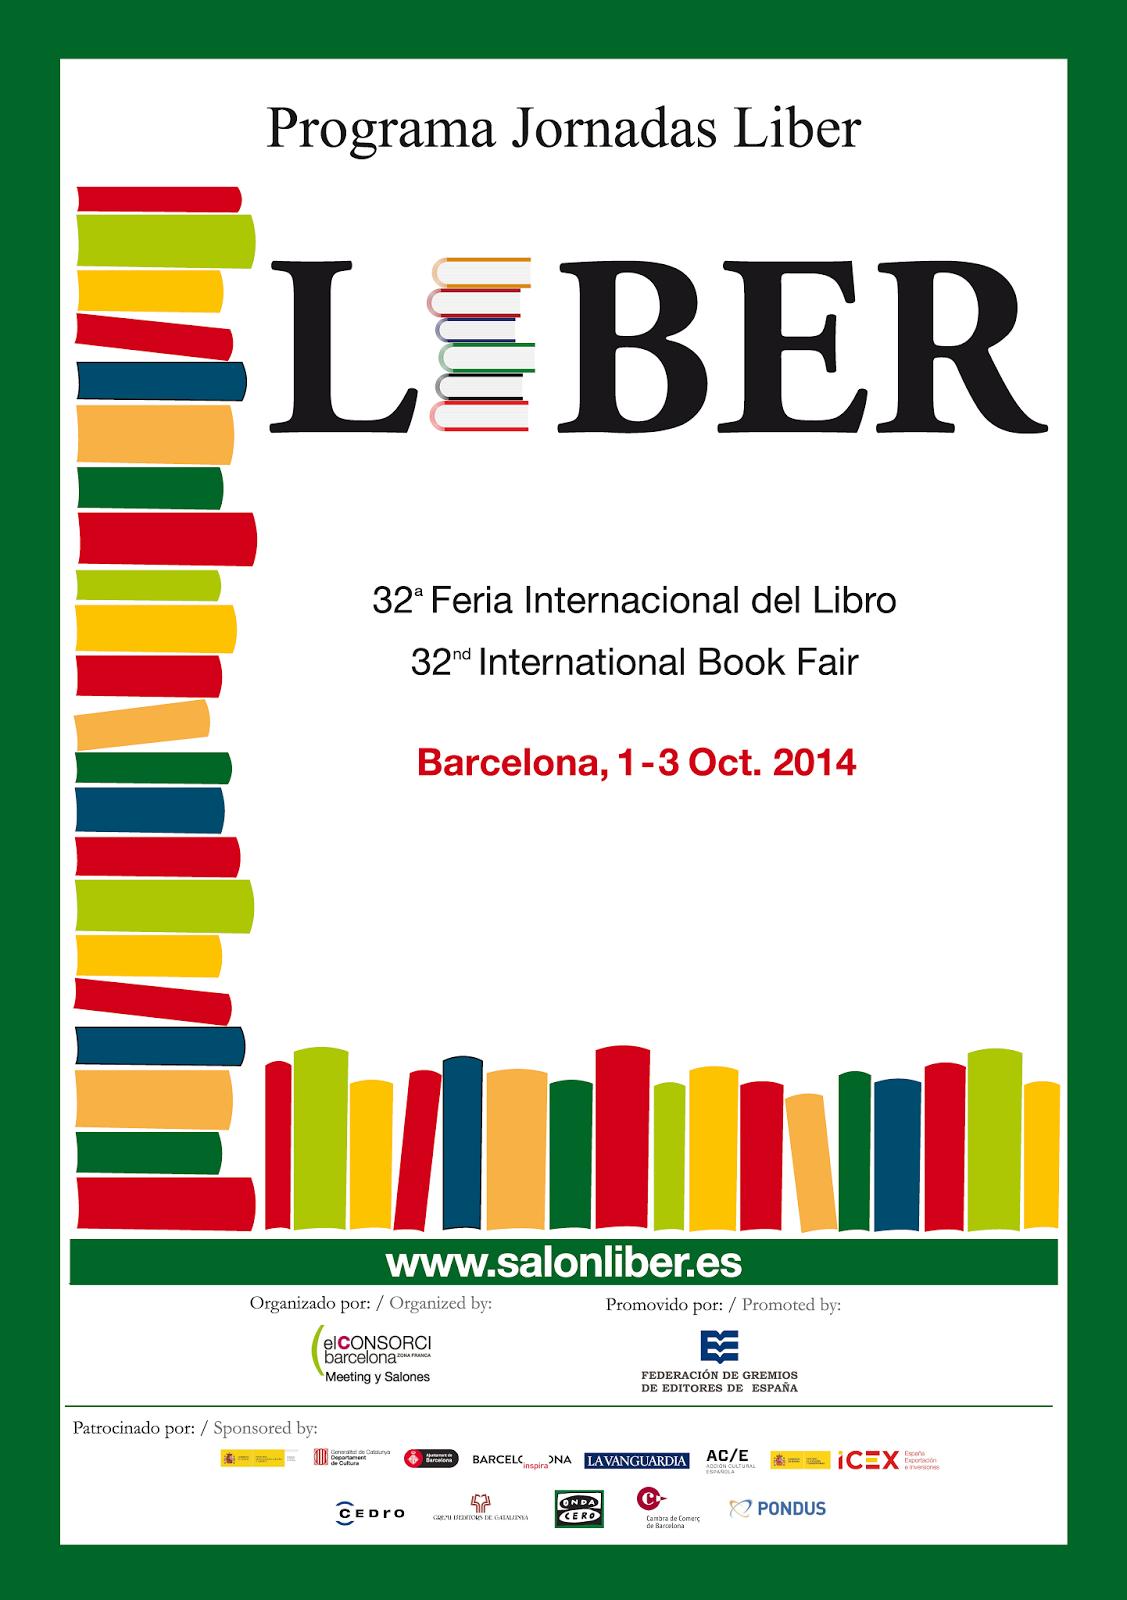 Programa jornadas LIBER 2014